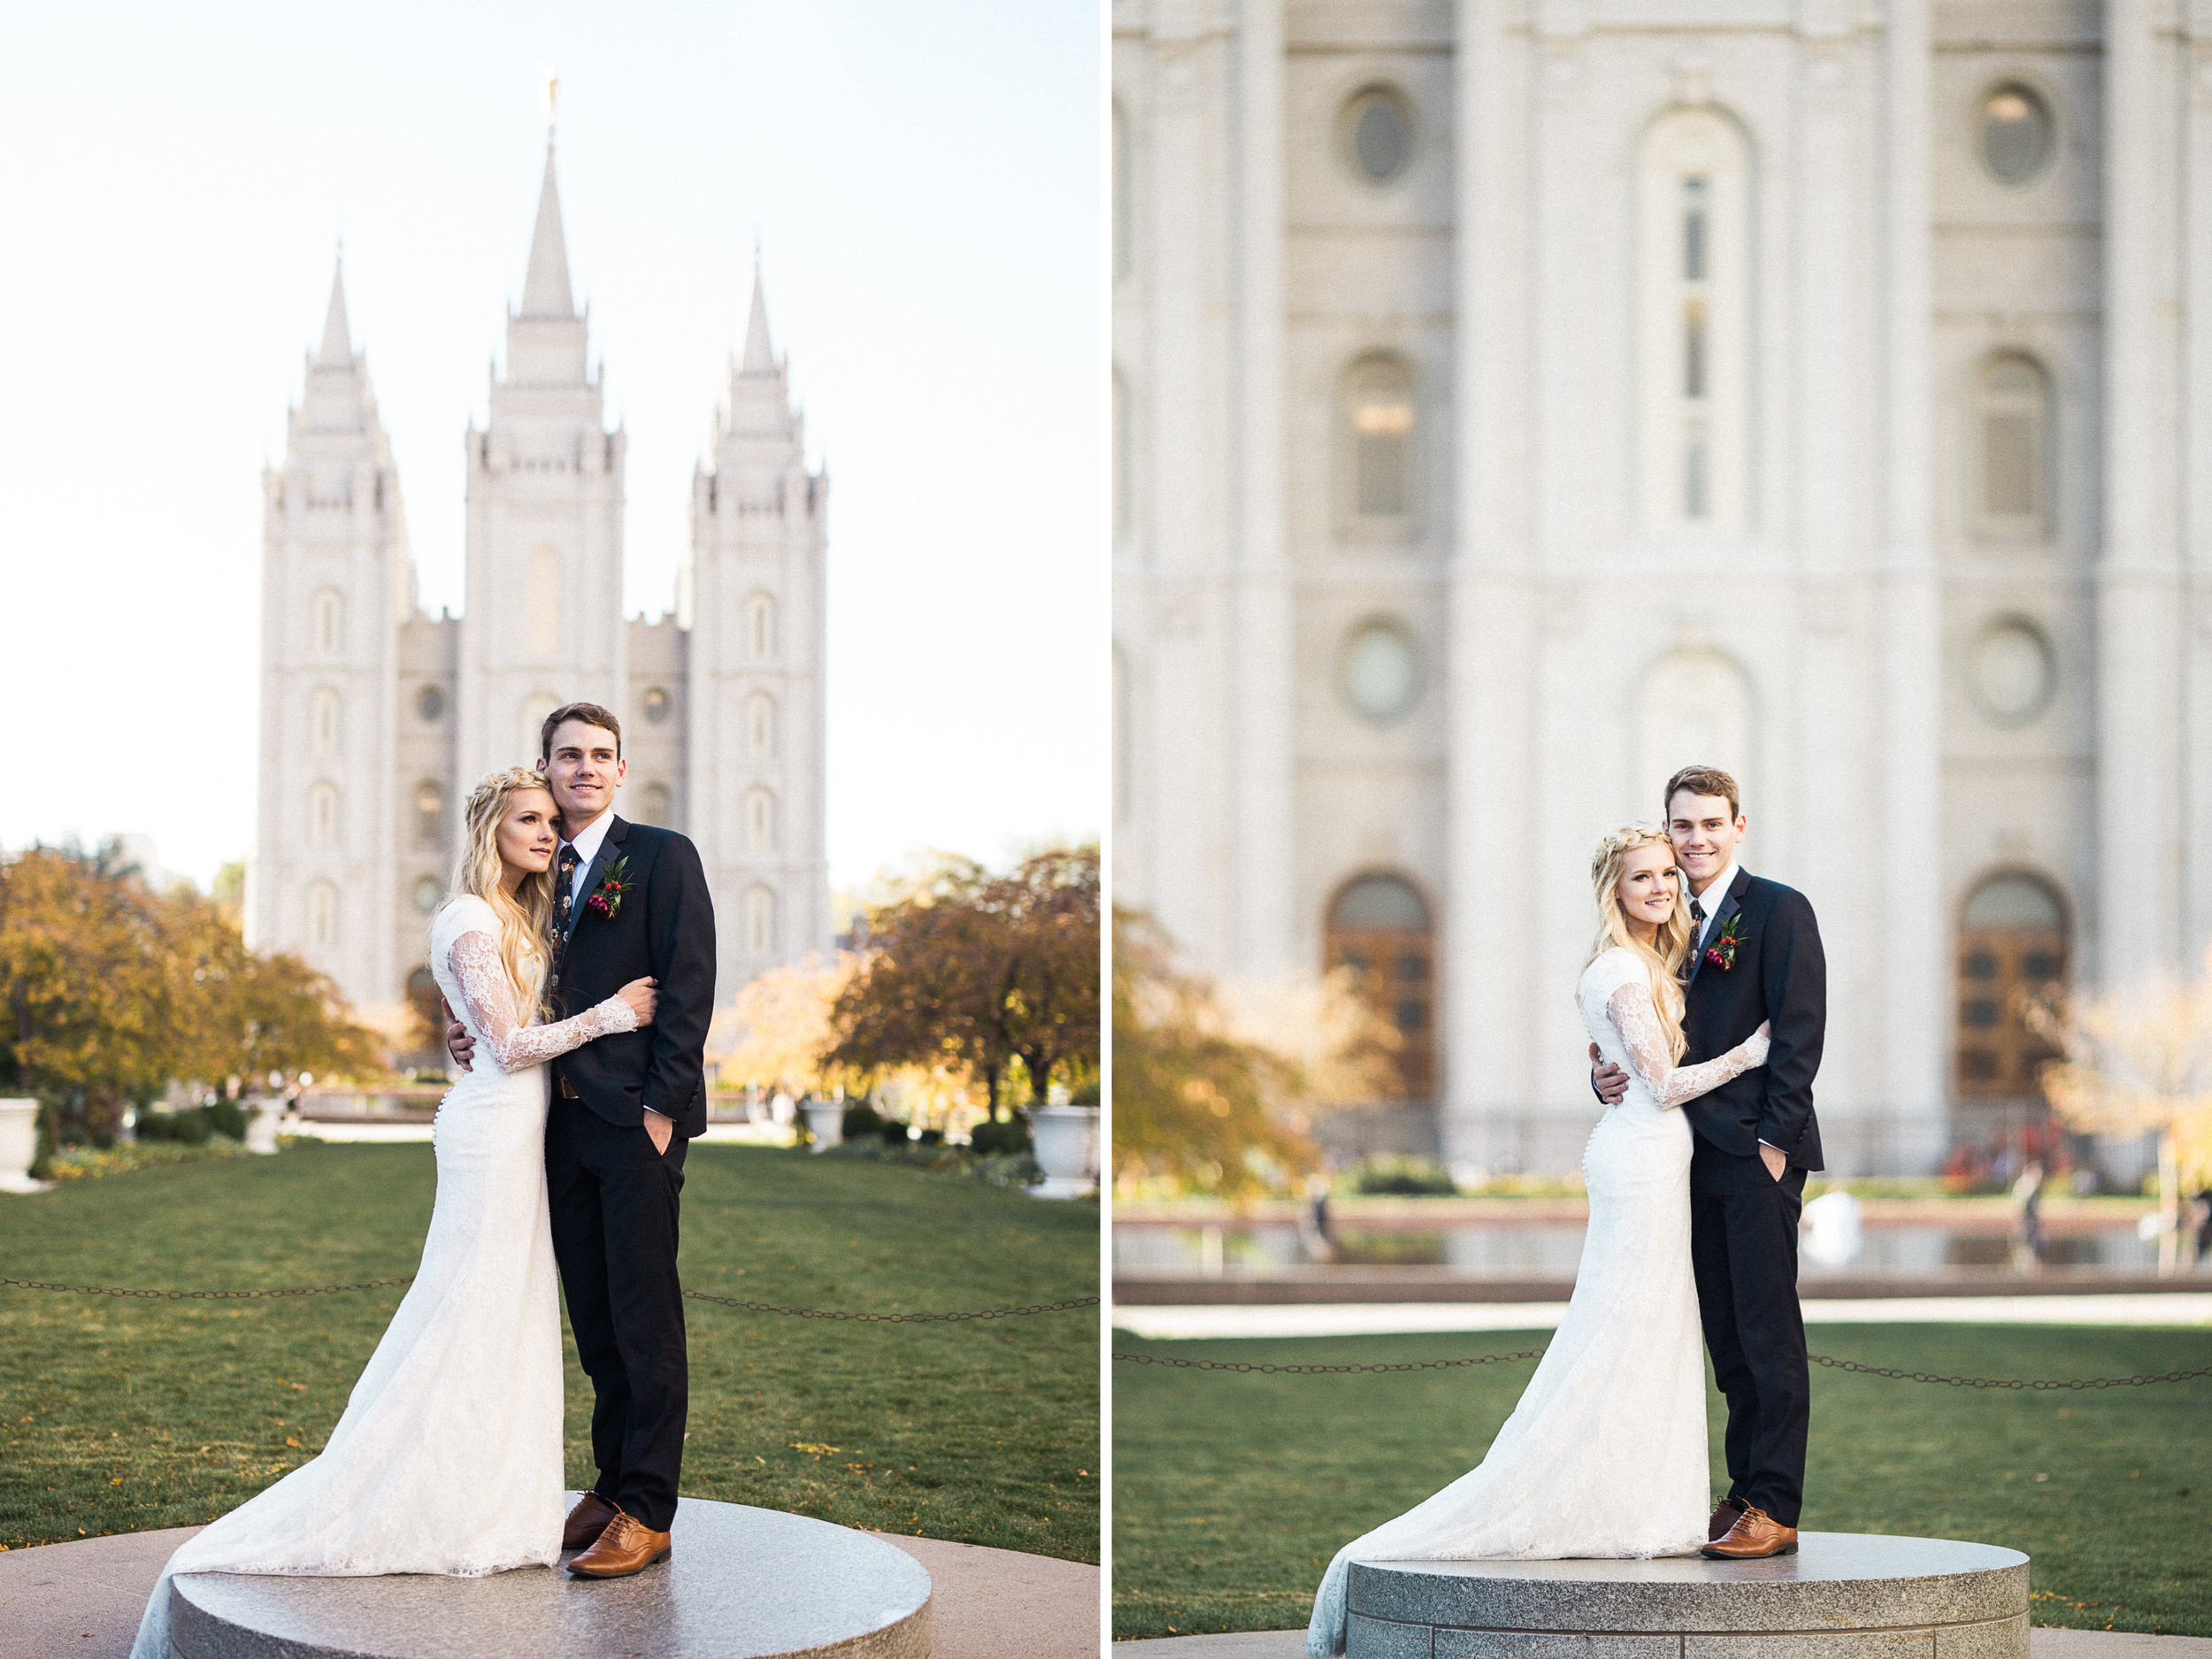 Salt-Lake-City-Temple-Wedding-Photographer-00.jpg